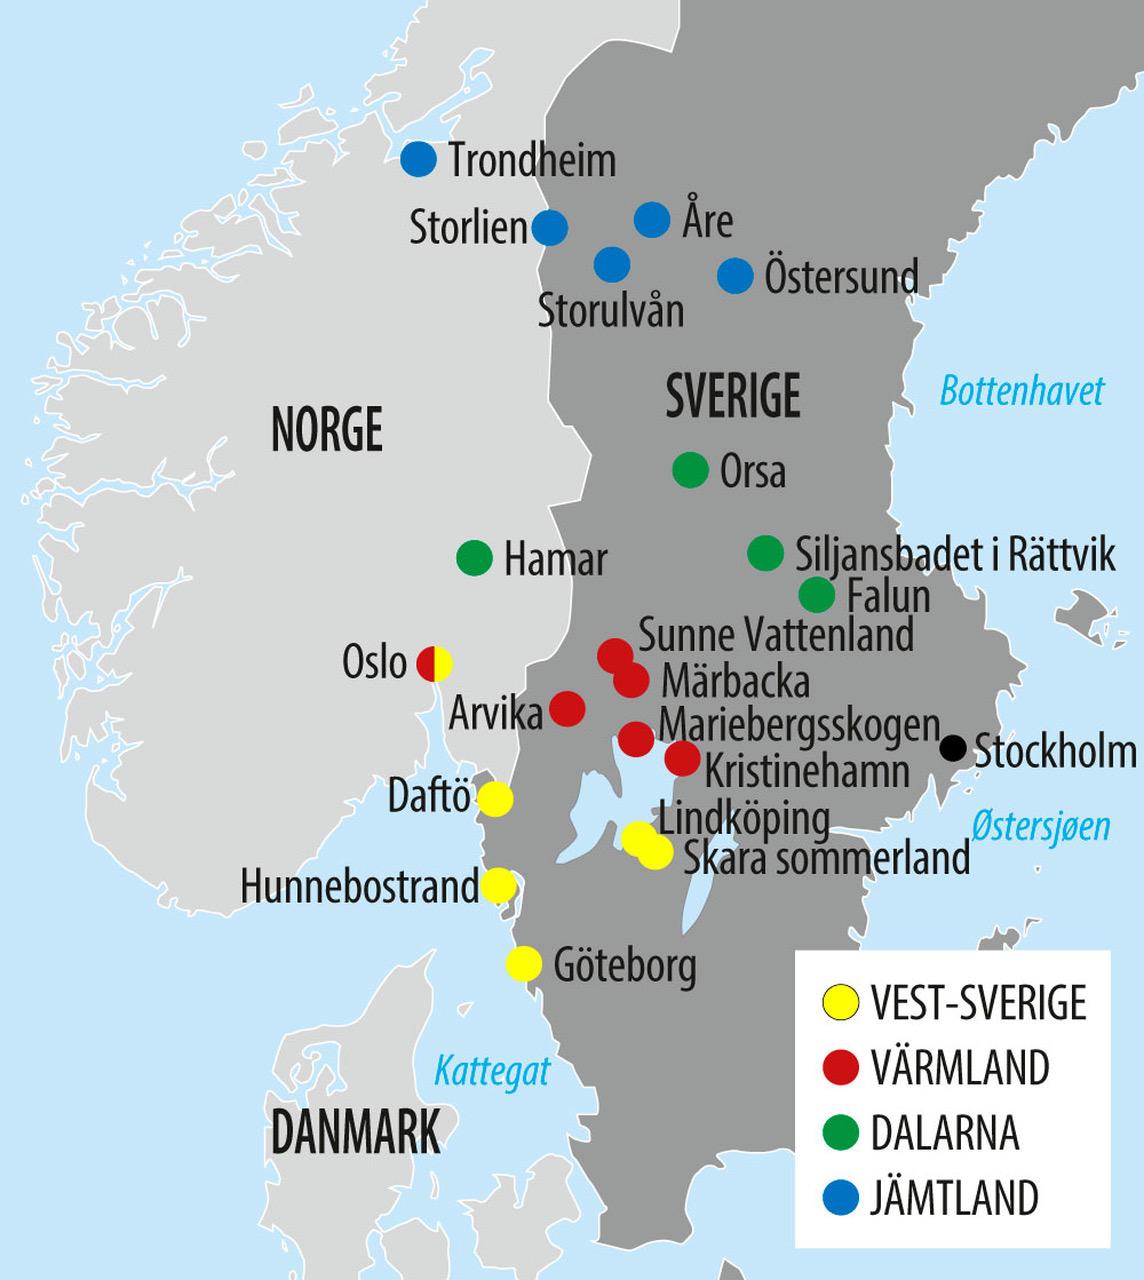 sverige kart falun Ta med familien på biltur til Sverige sverige kart falun